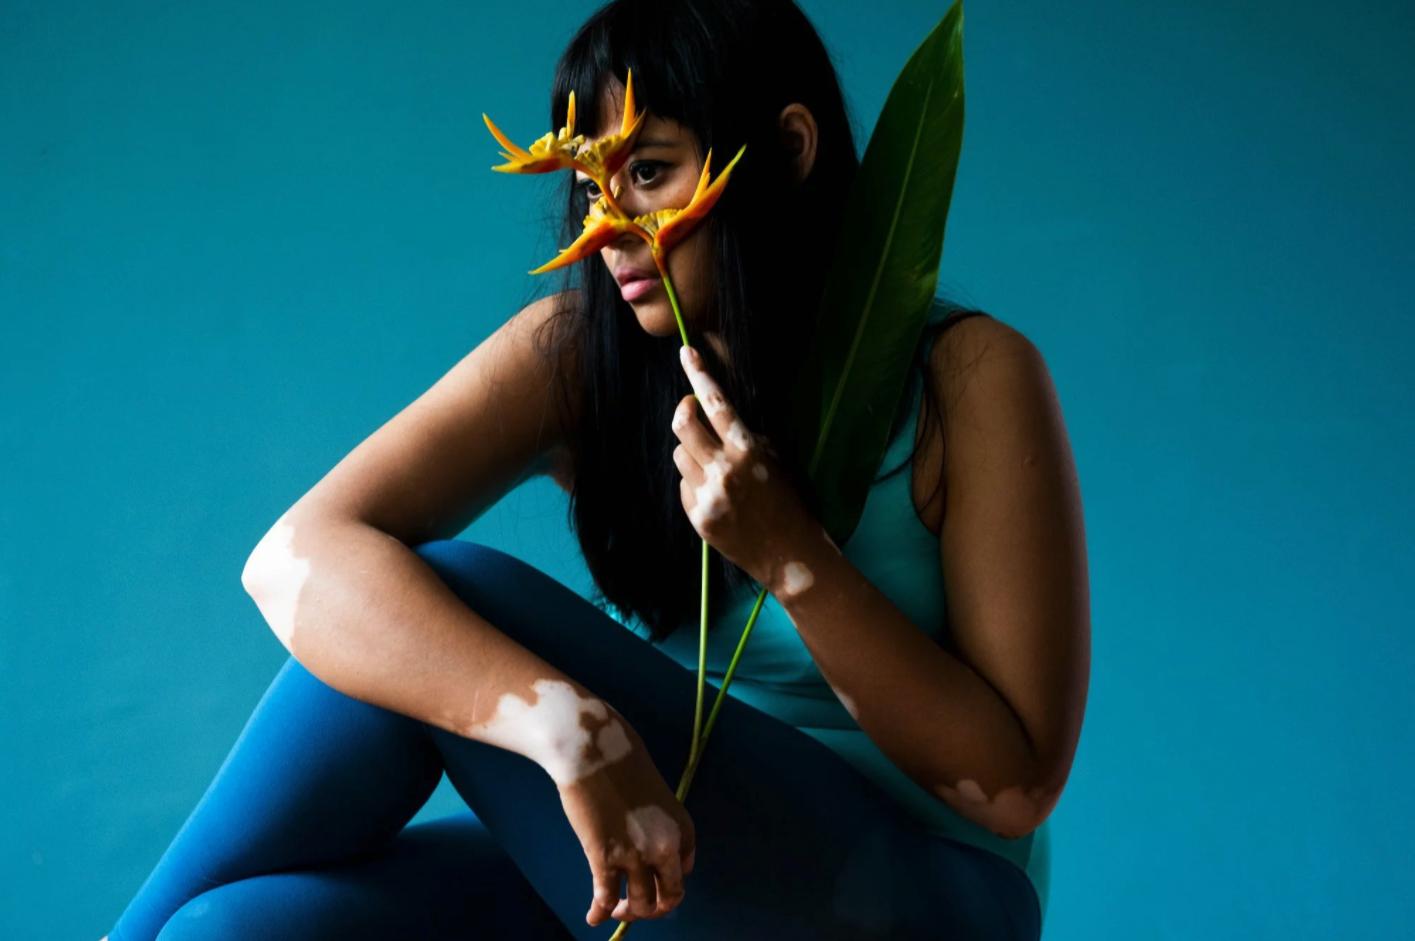 A self-portrait for the Vitiligo series (Photo: Nadirah Zakariya)